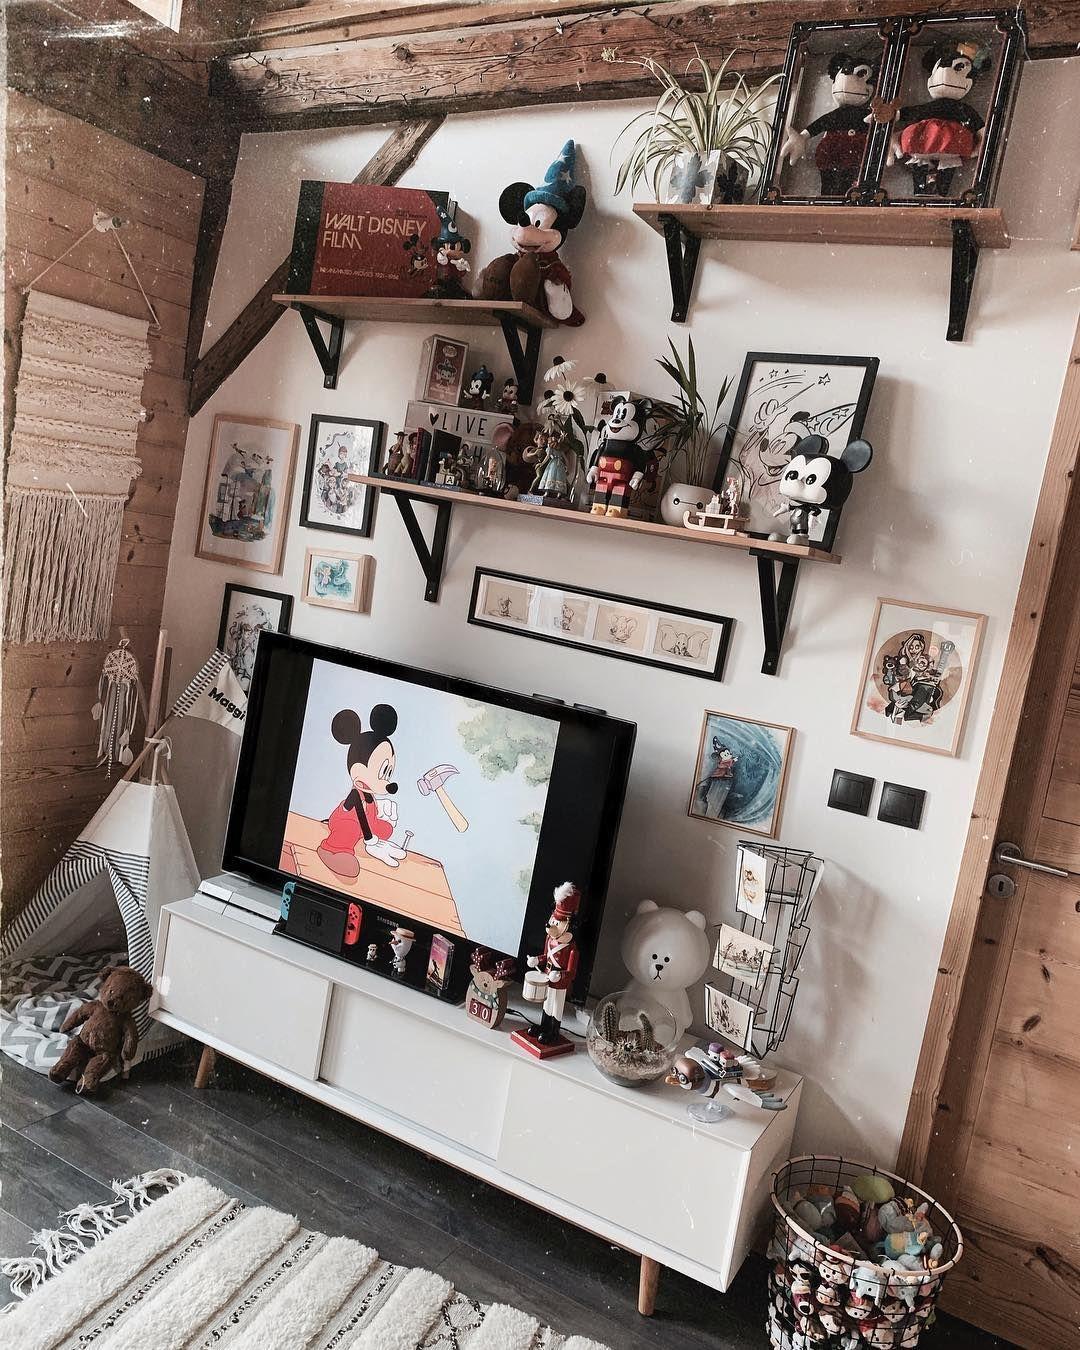 Mickey Living Room Disney Home I Disney Decor I Disney